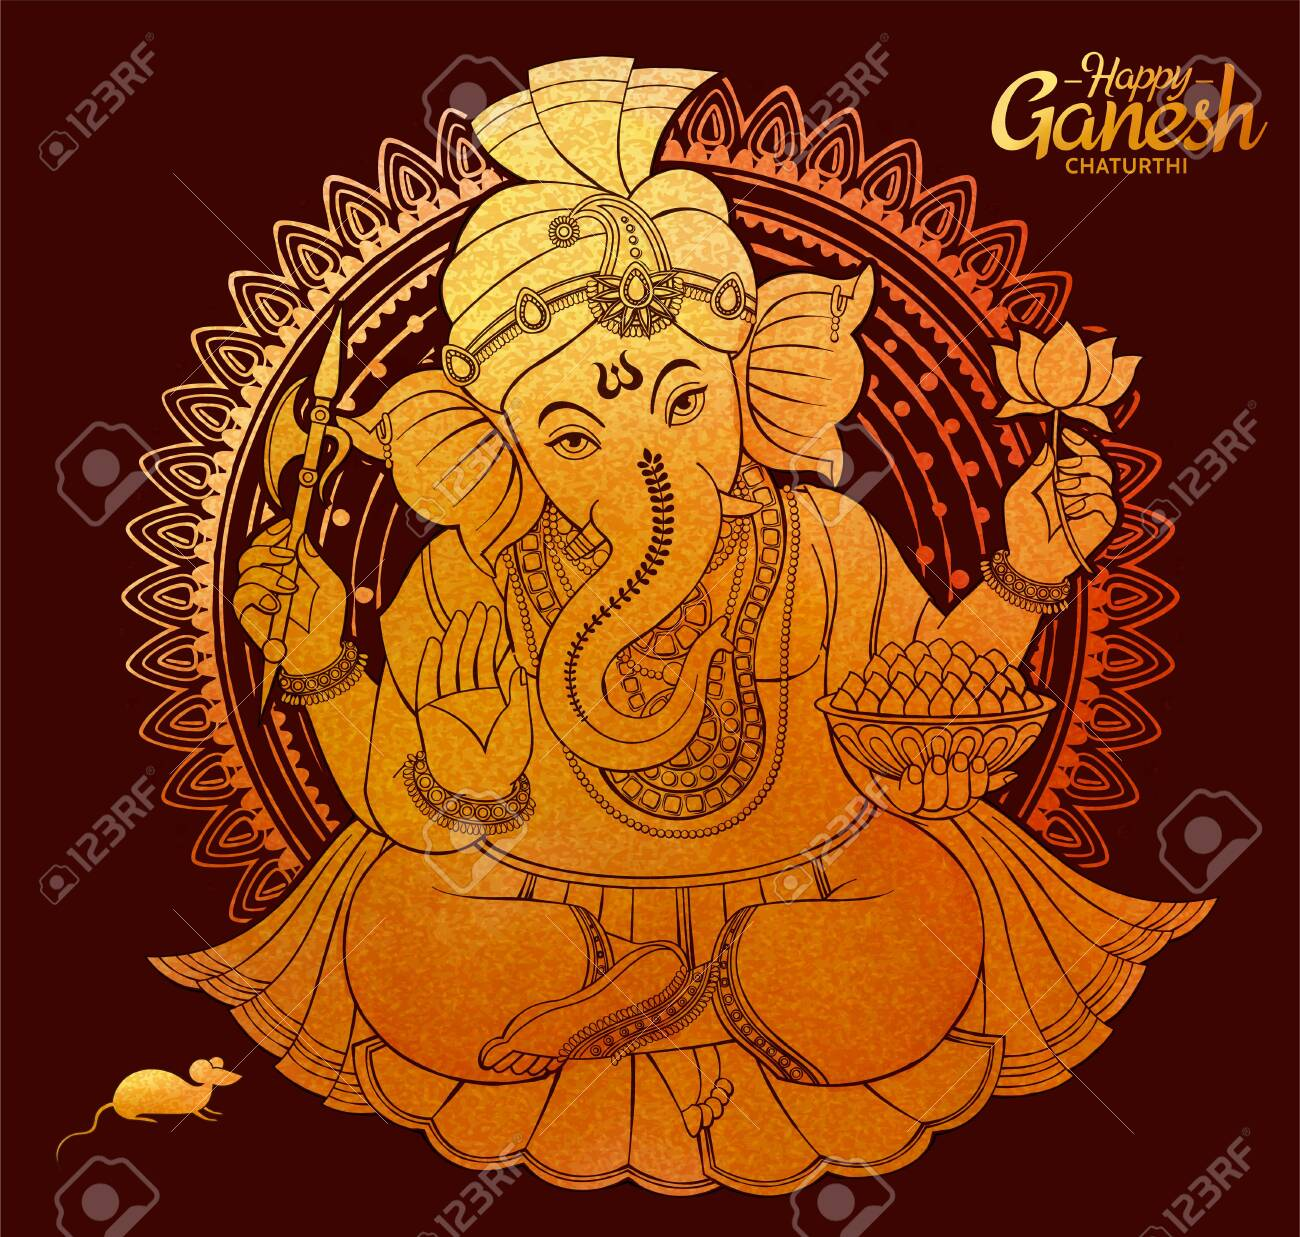 Happy Ganesh Chaturthi design in golden color - 127825065